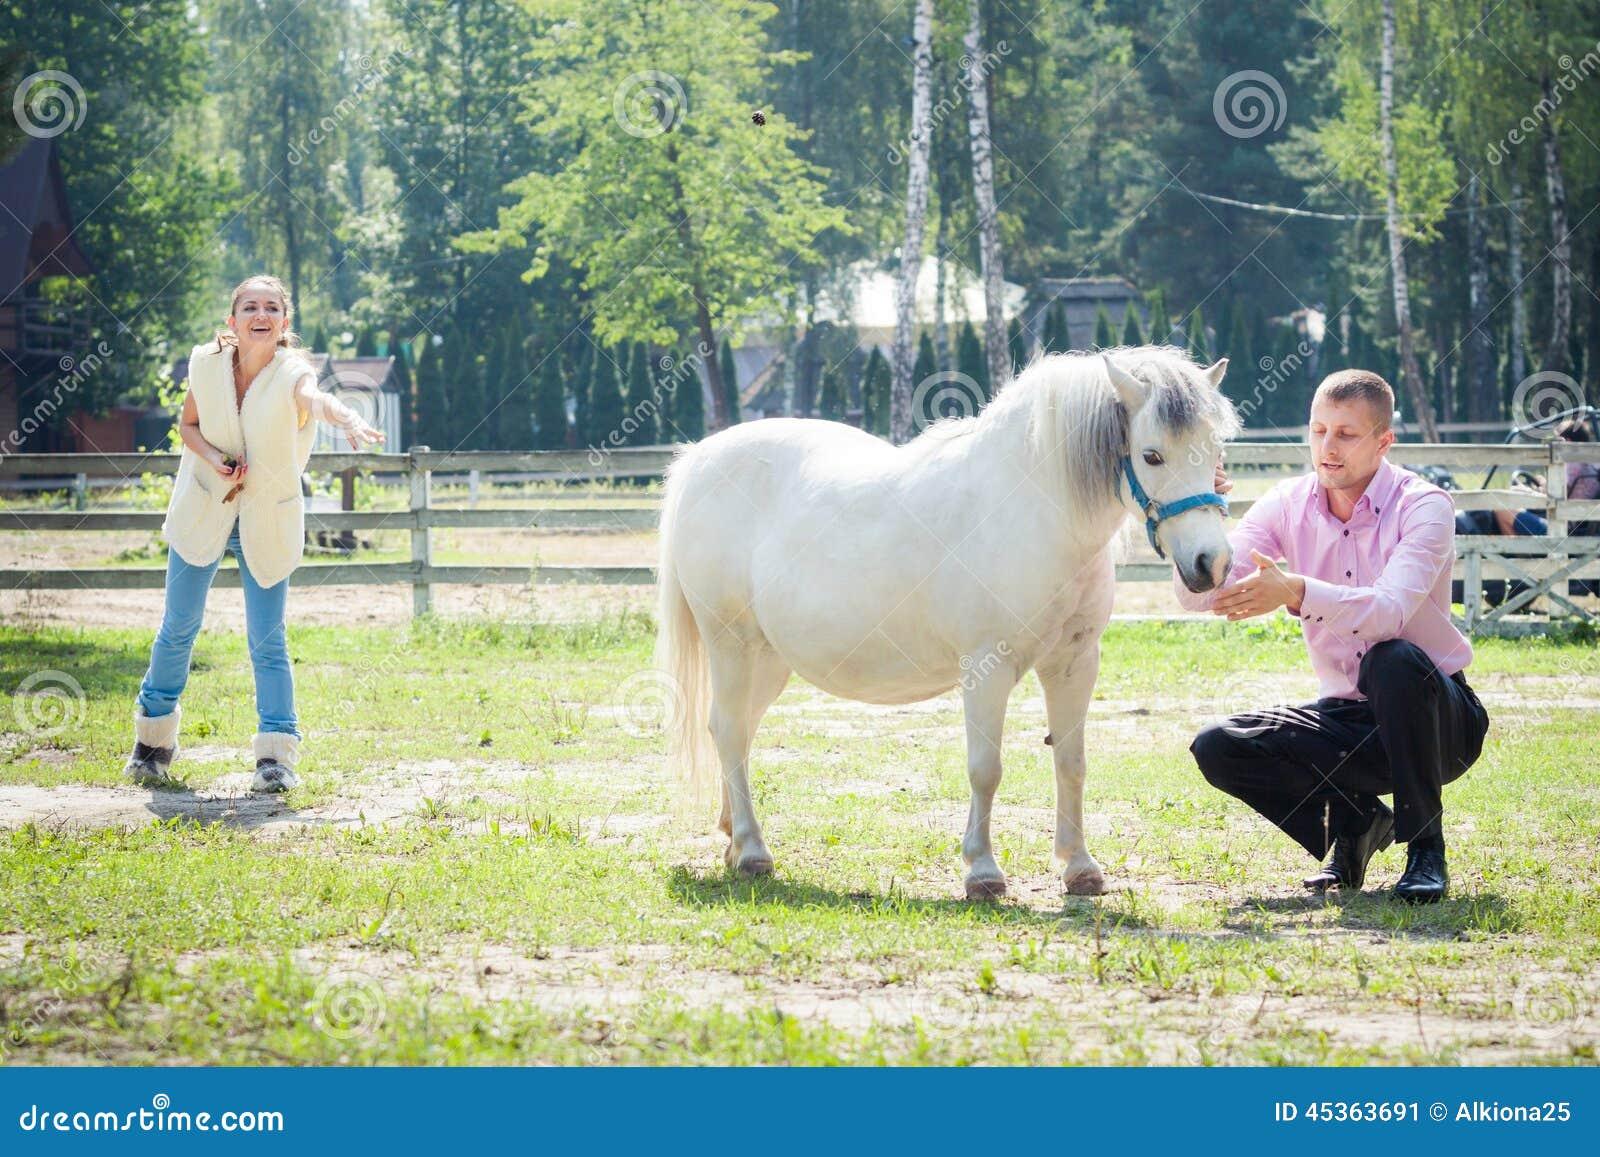 Homme, fille et cheval